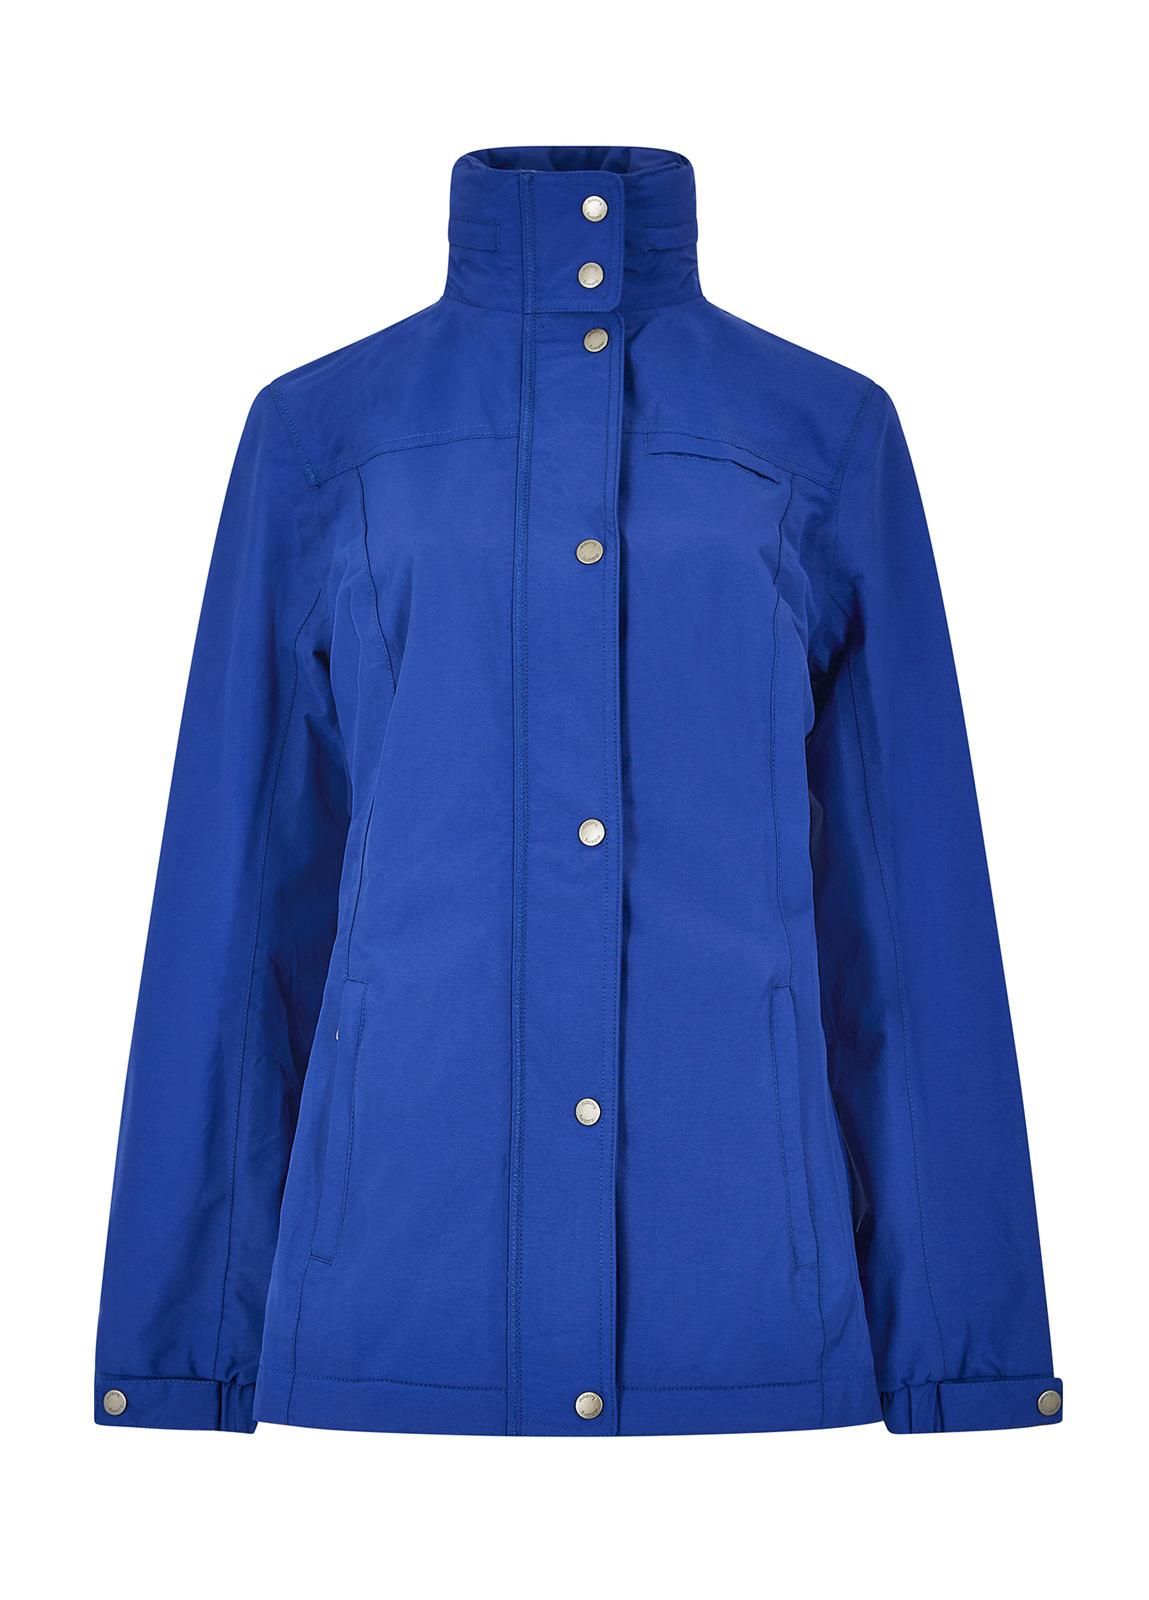 Dubarry_ Aran Jacket - Royal Blue_Image_2